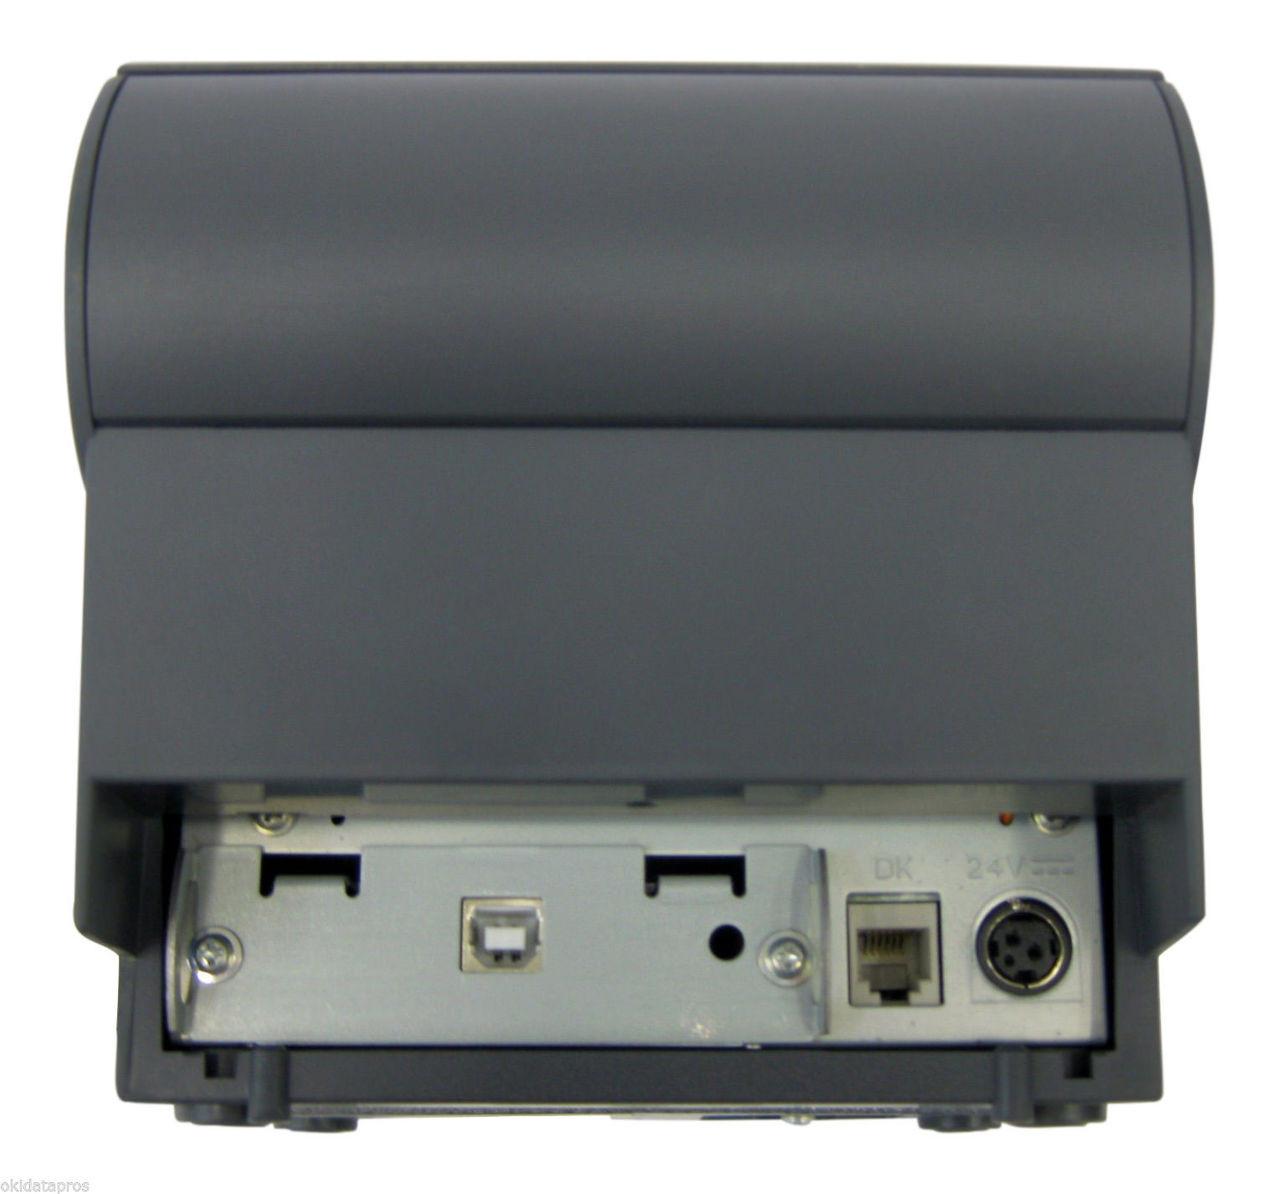 EPSON TM-T88IV RECEIPT PRINTER DRIVER FOR WINDOWS MAC